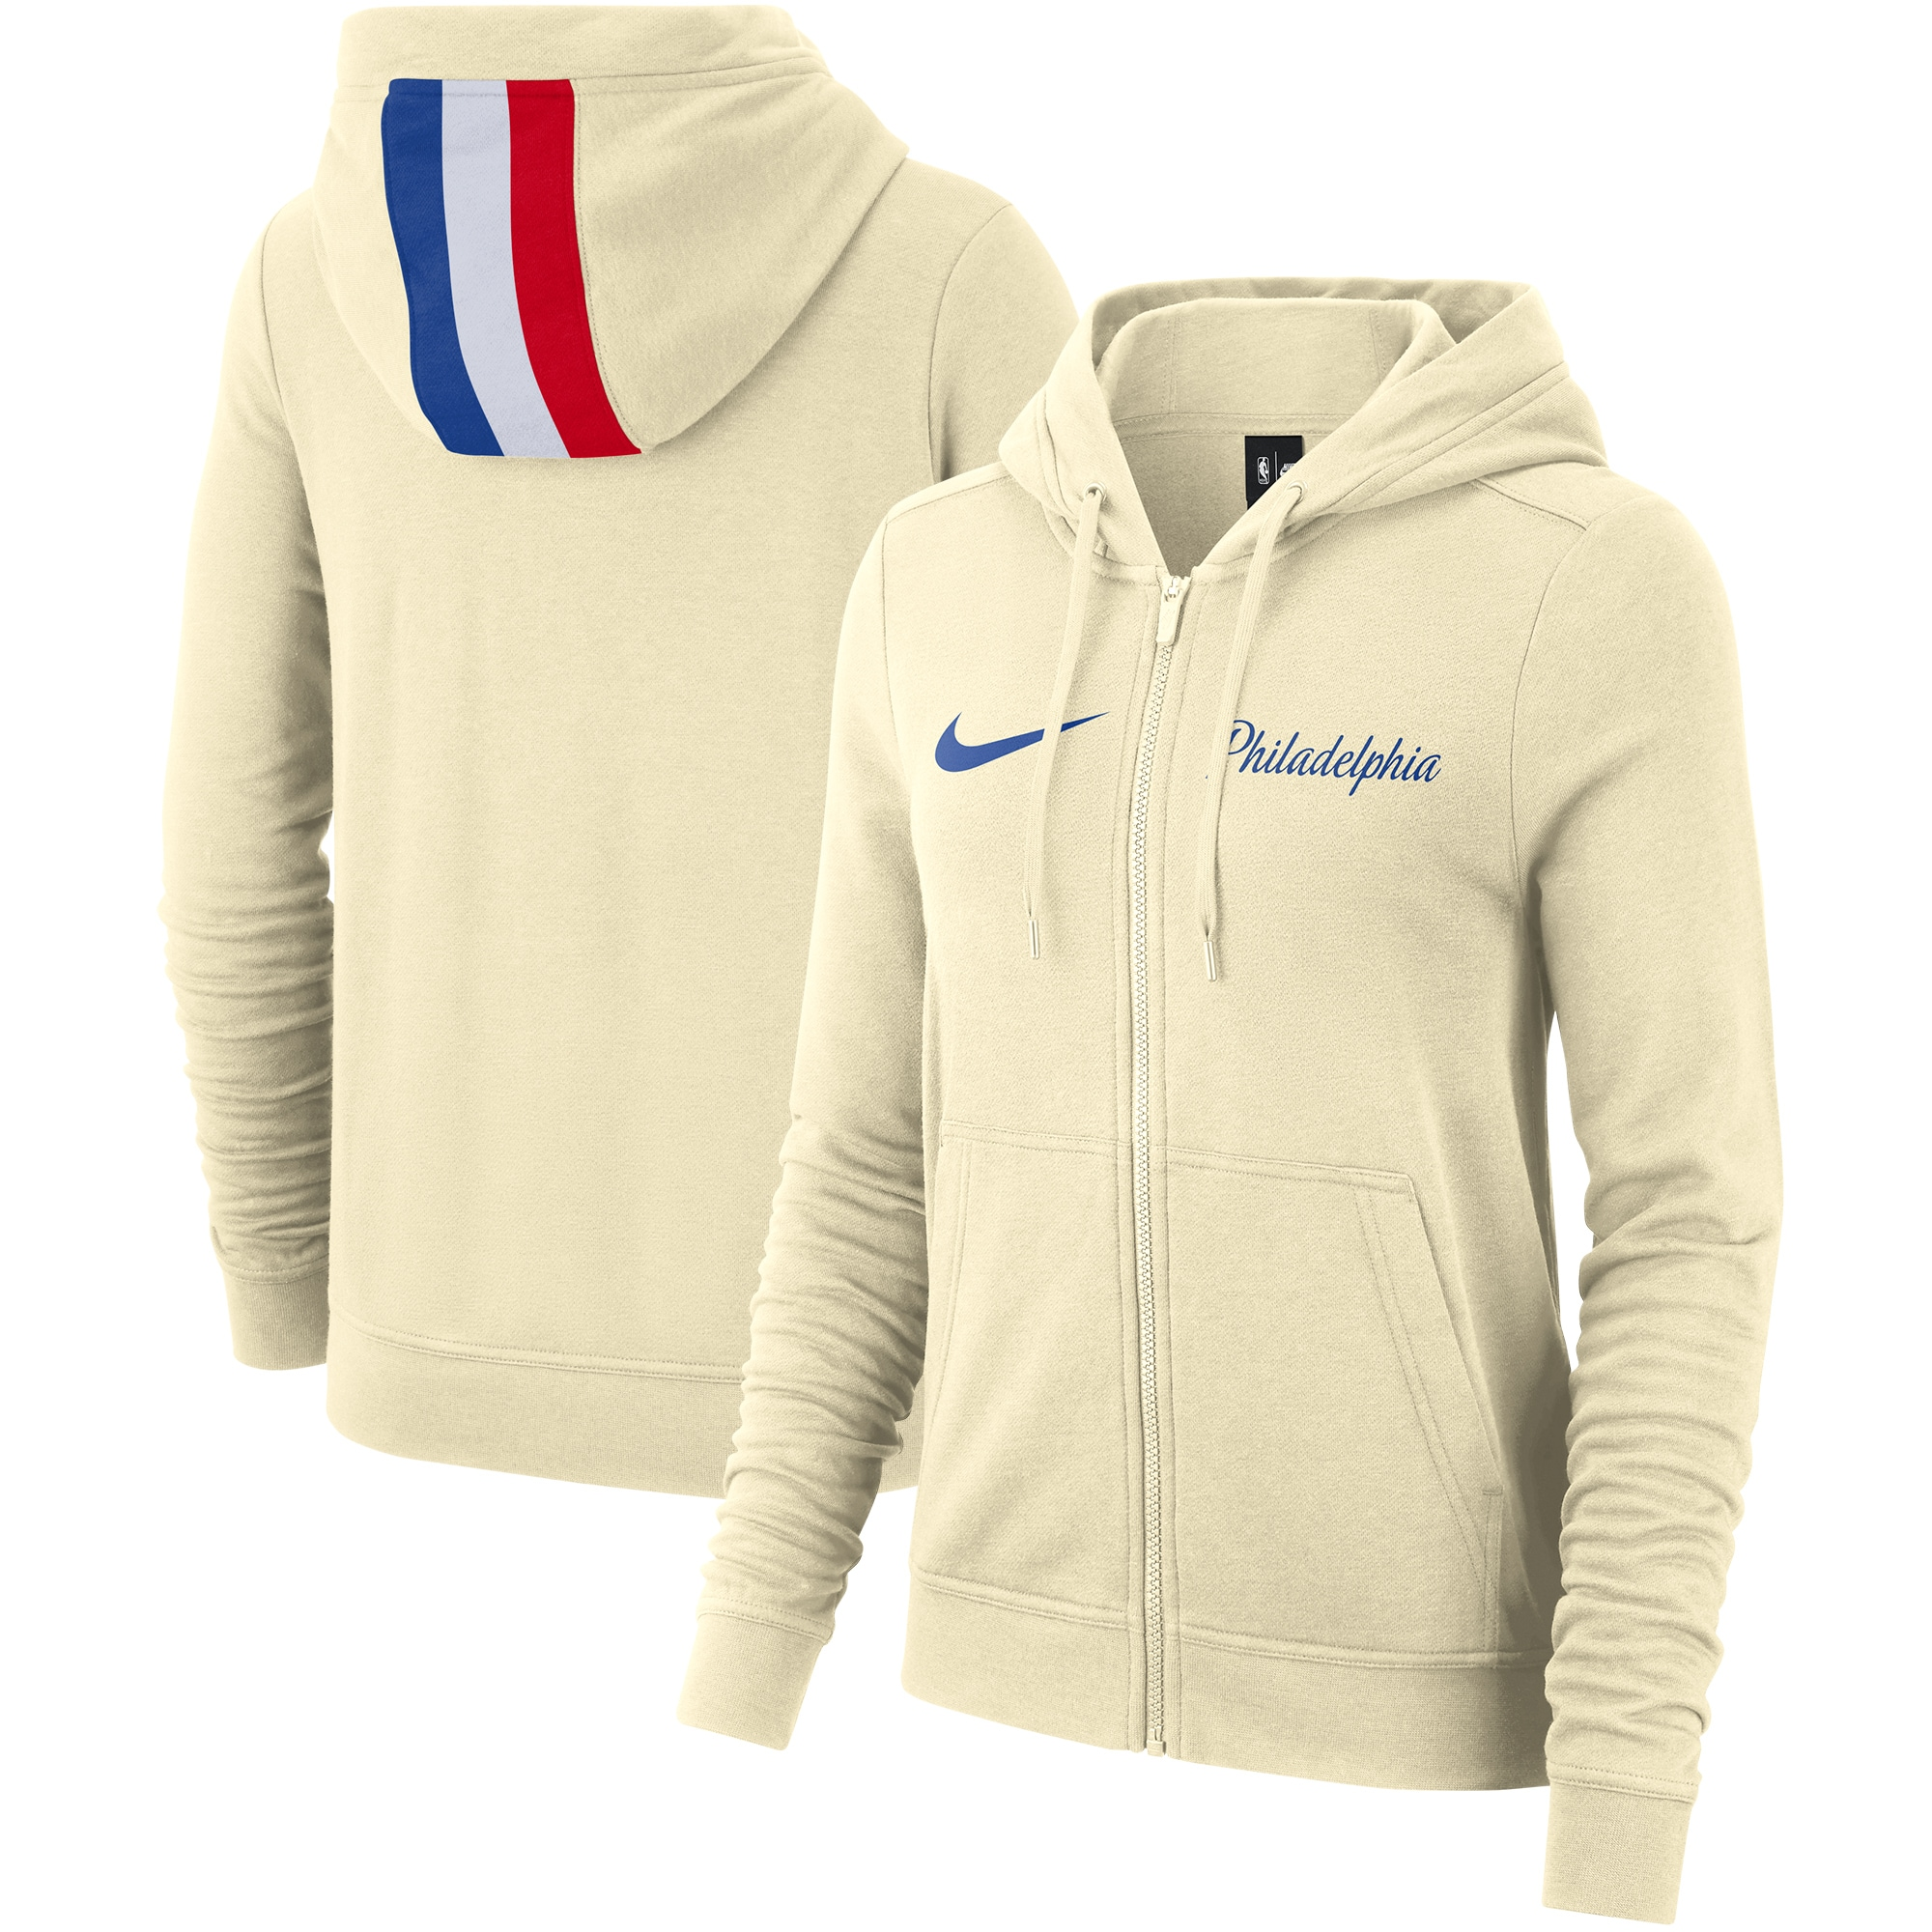 Philadelphia 76ers Nike Women's 2019/20 City Edition Full-Zip Hoodie - Cream